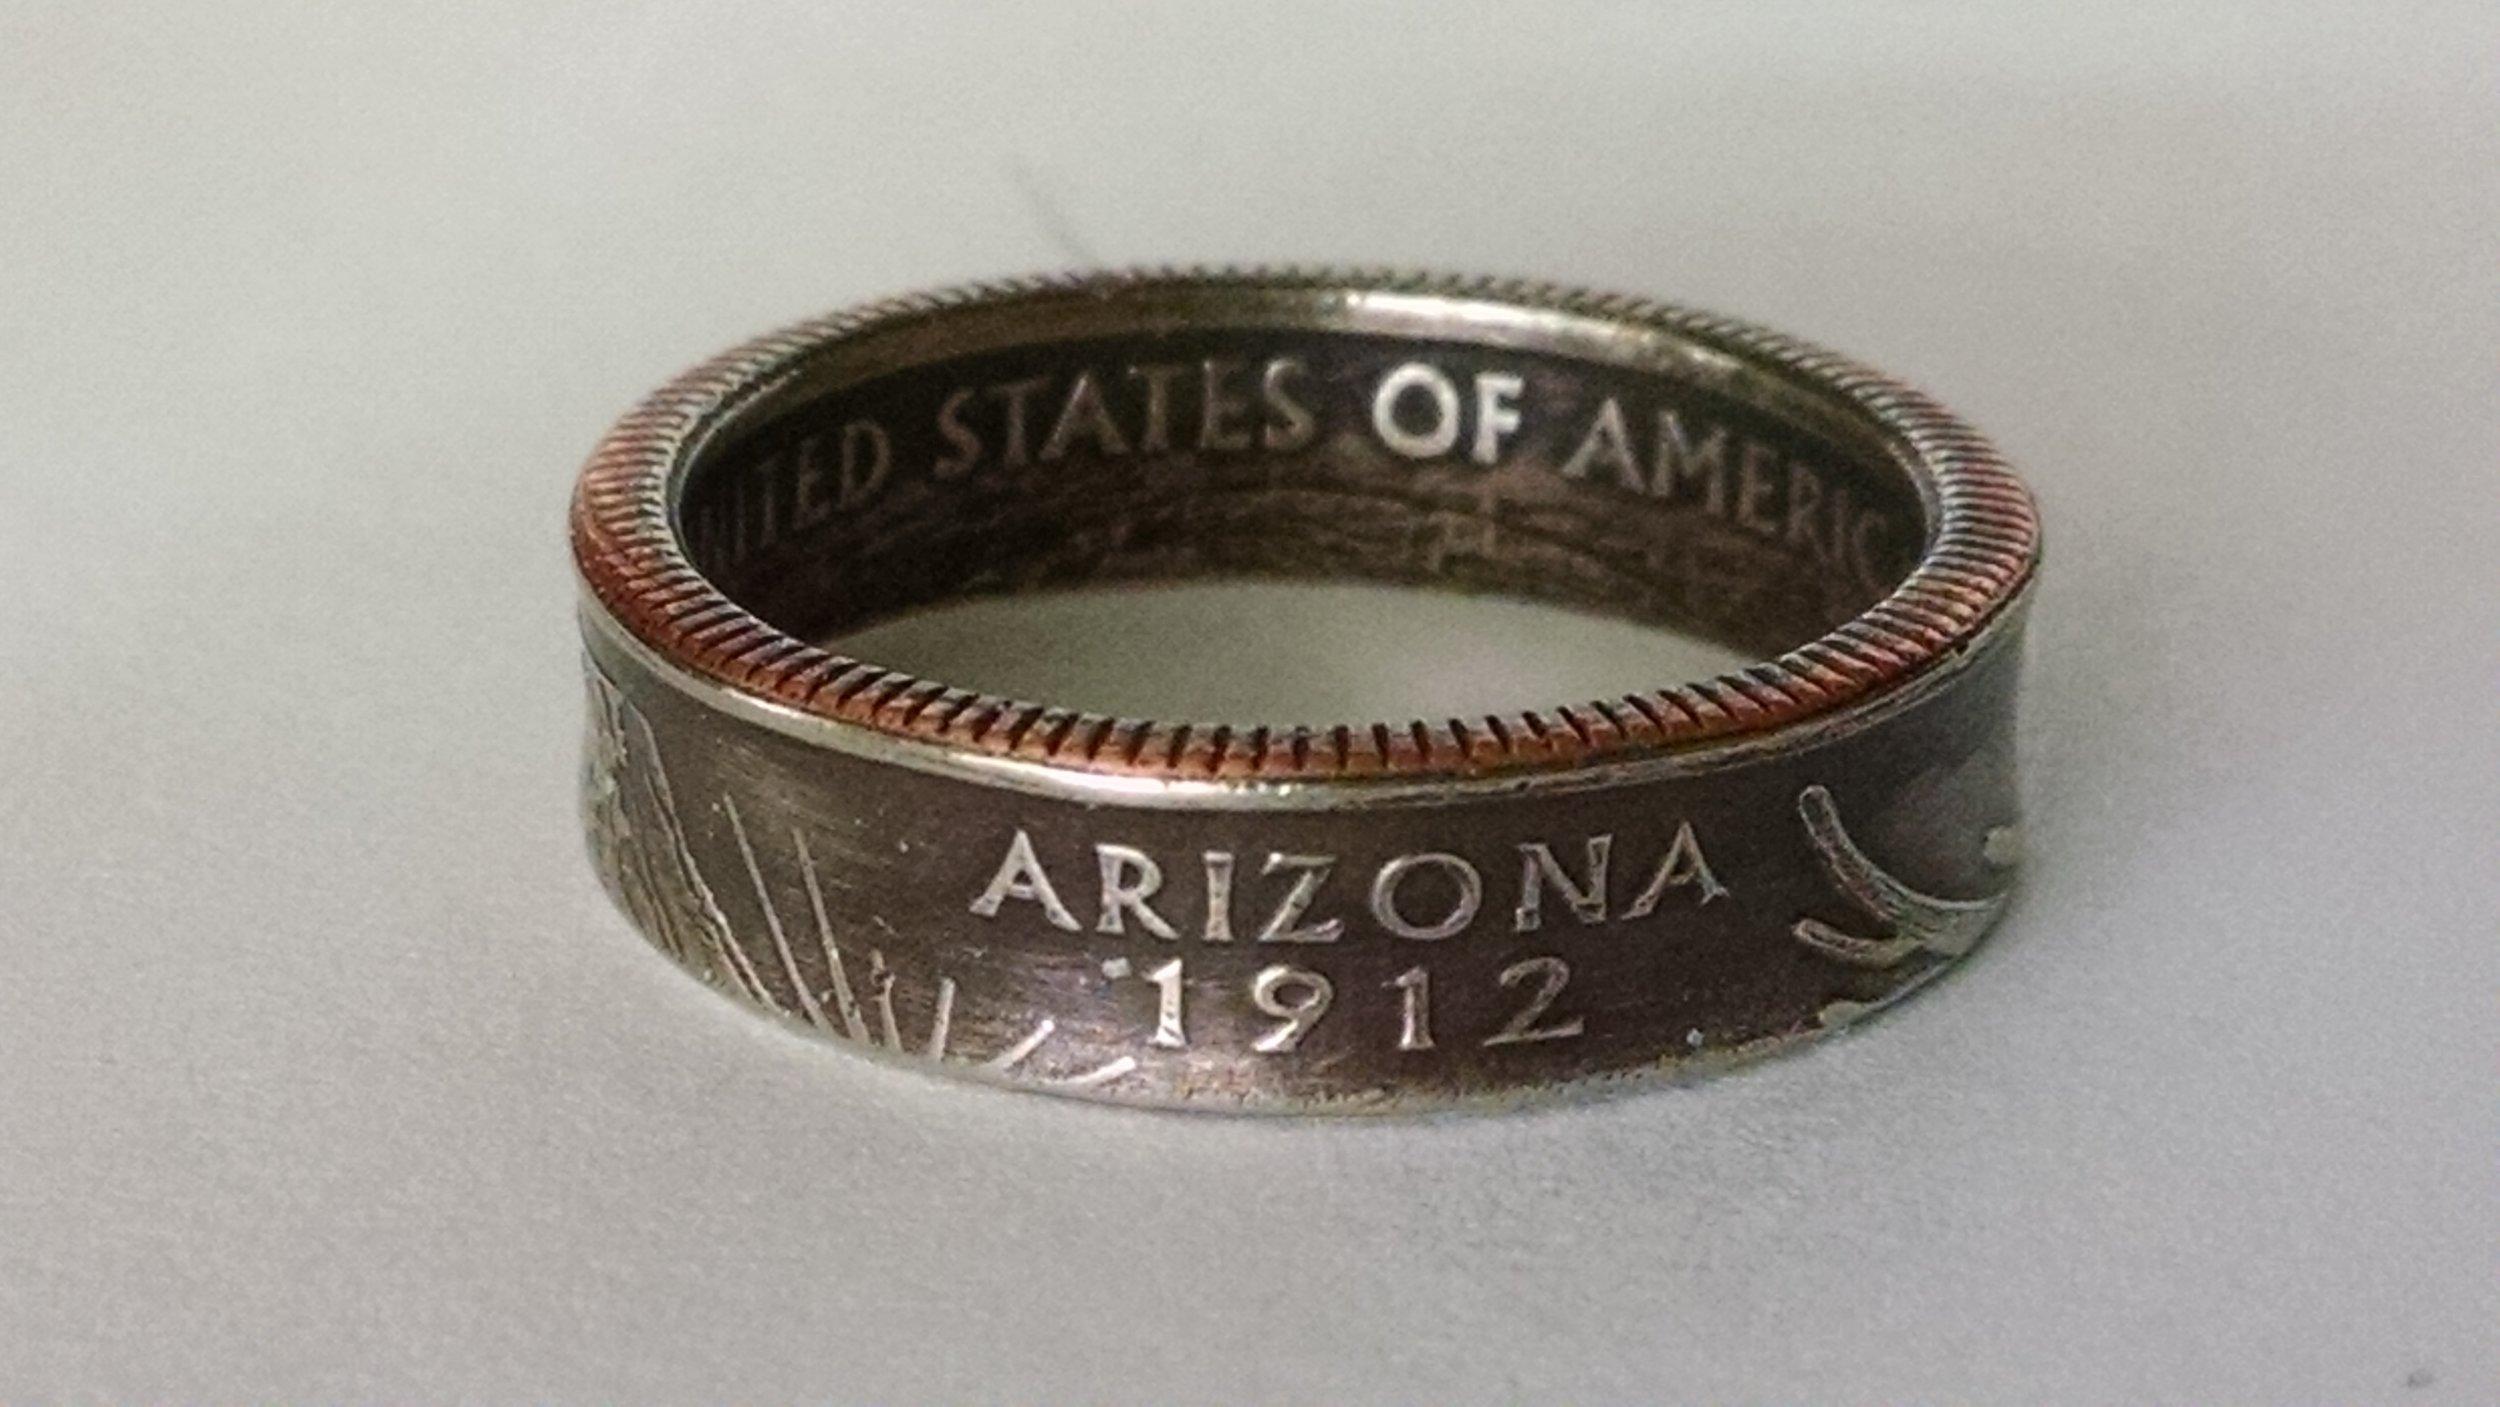 Arizona Coin Ring.jpg